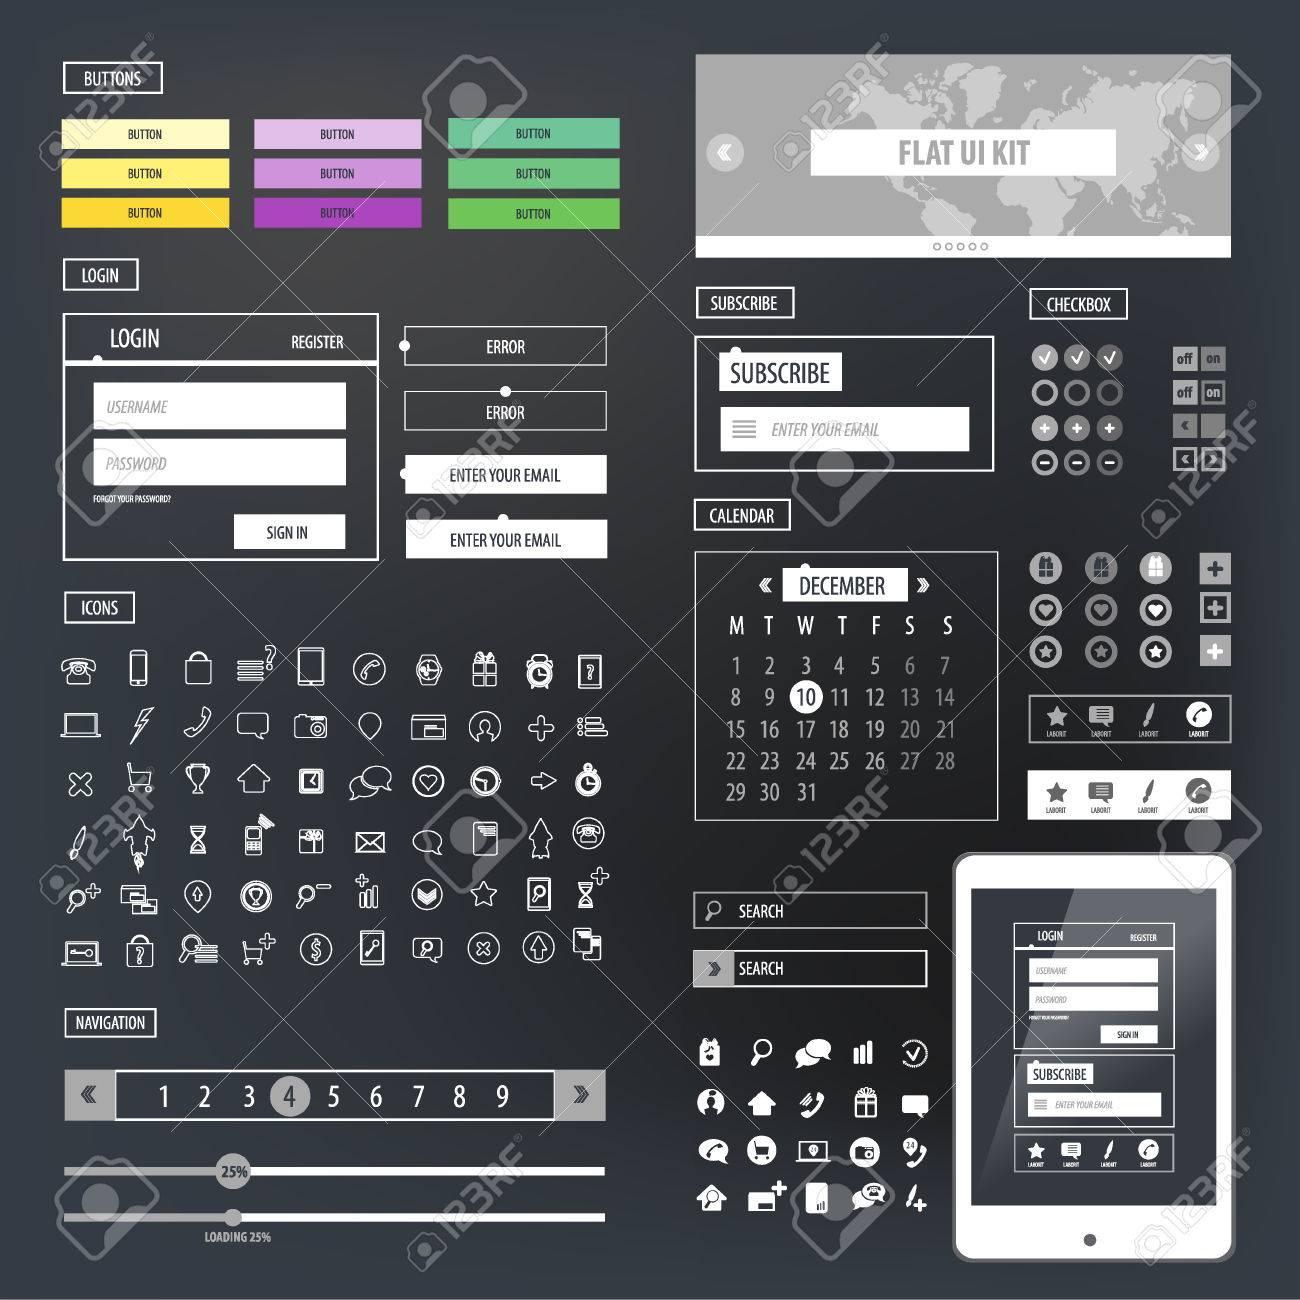 Ui Kit Responsive Web Design Icons Template Mockup Royalty Free